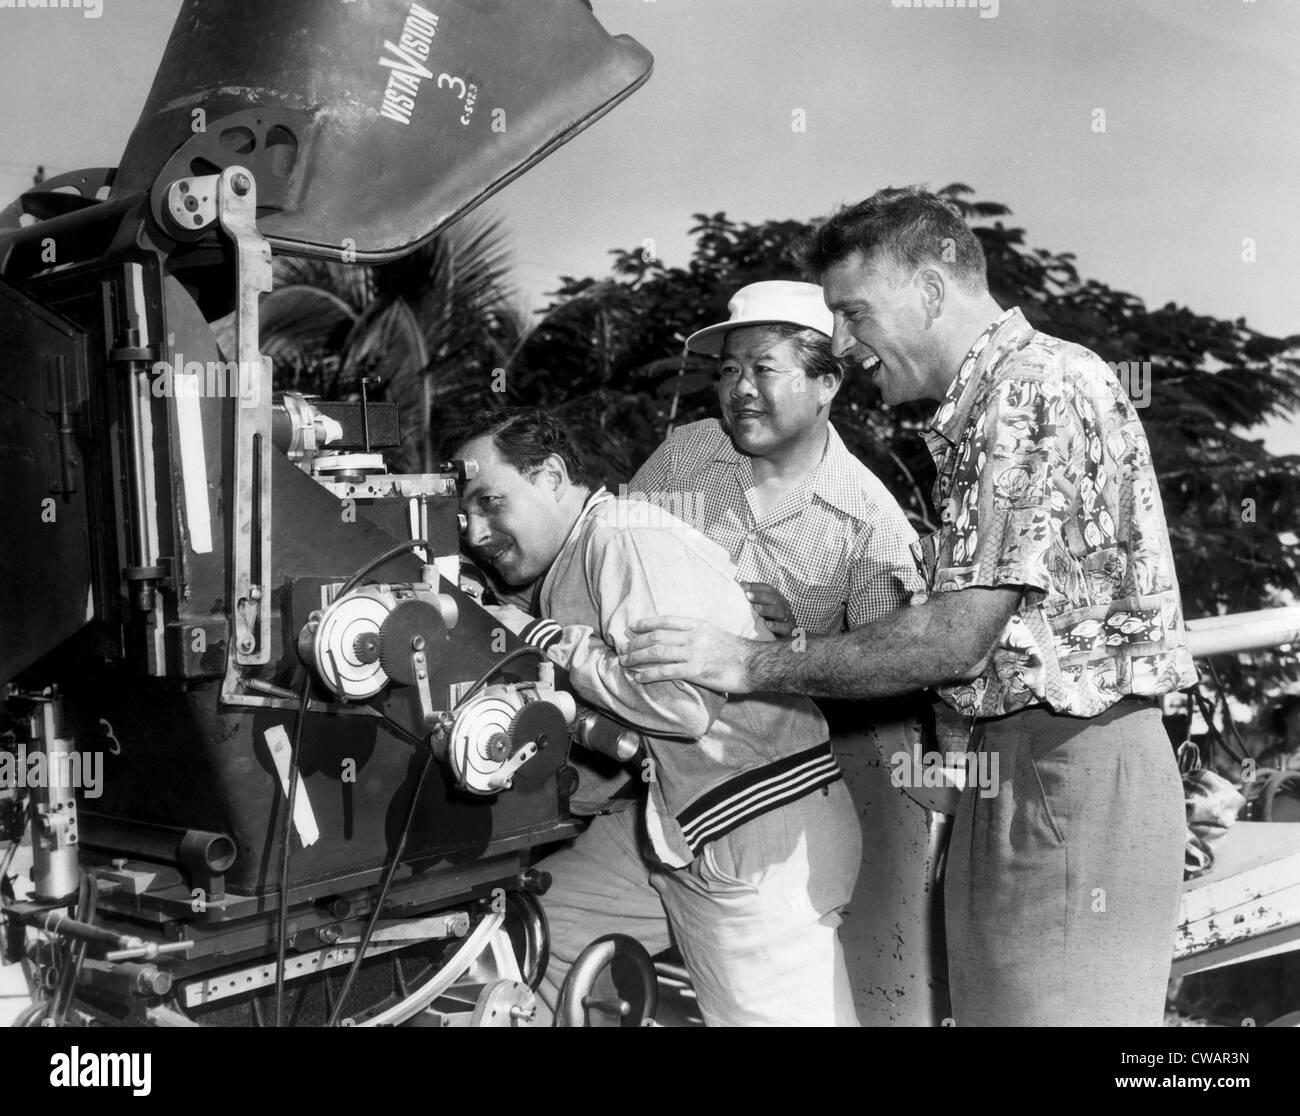 THE ROSE TATTOO, Screenwriter Tennessee Williams, cinematographer James Wong Howe, Burt Lancaster, on set, 1955.. - Stock Image